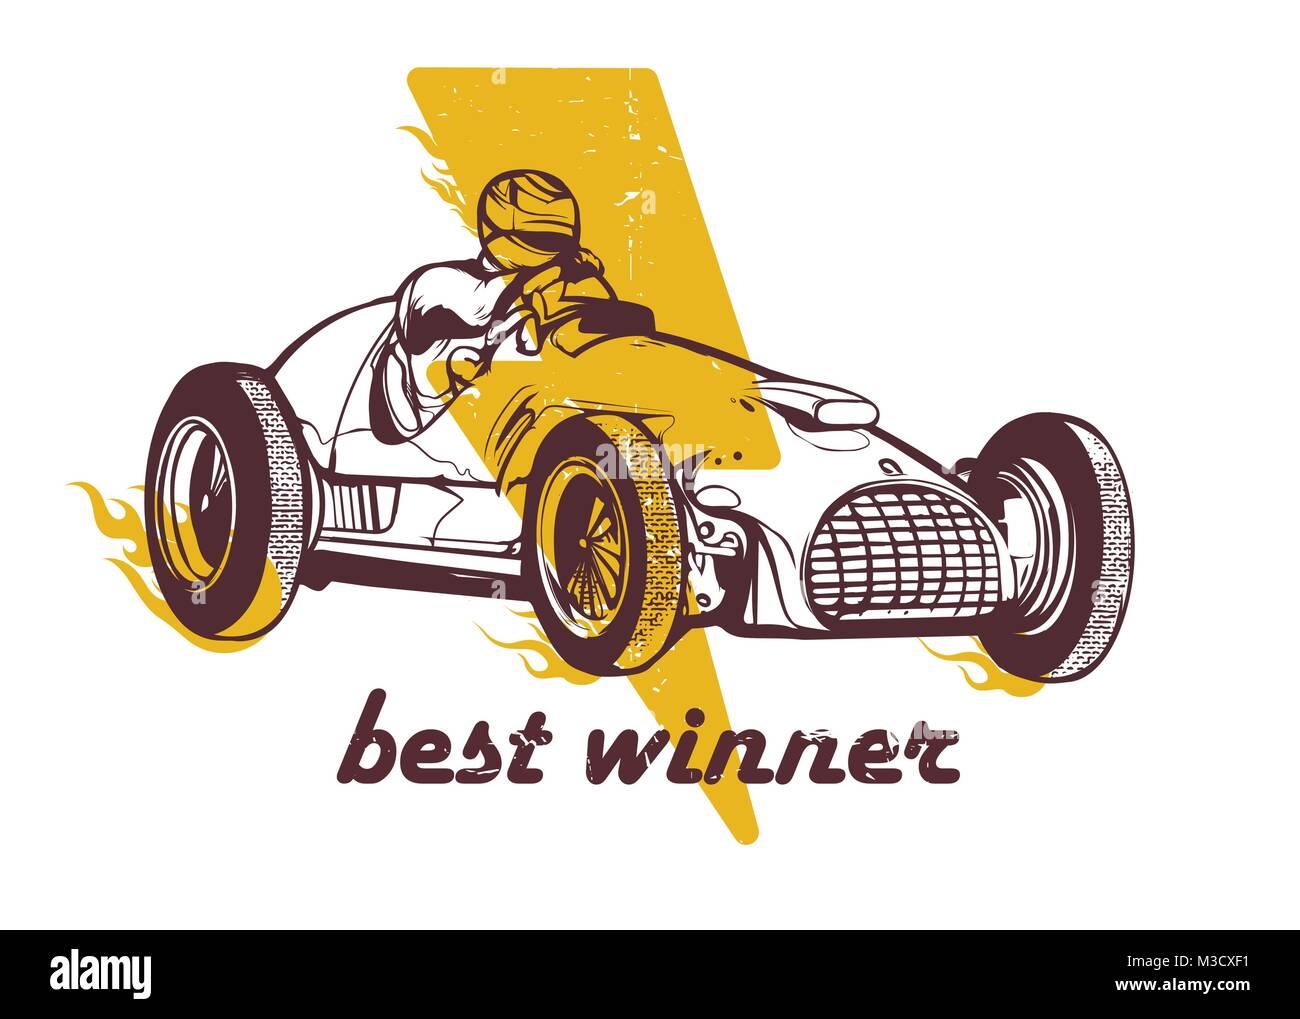 Vintage sport racing car - Stock Image